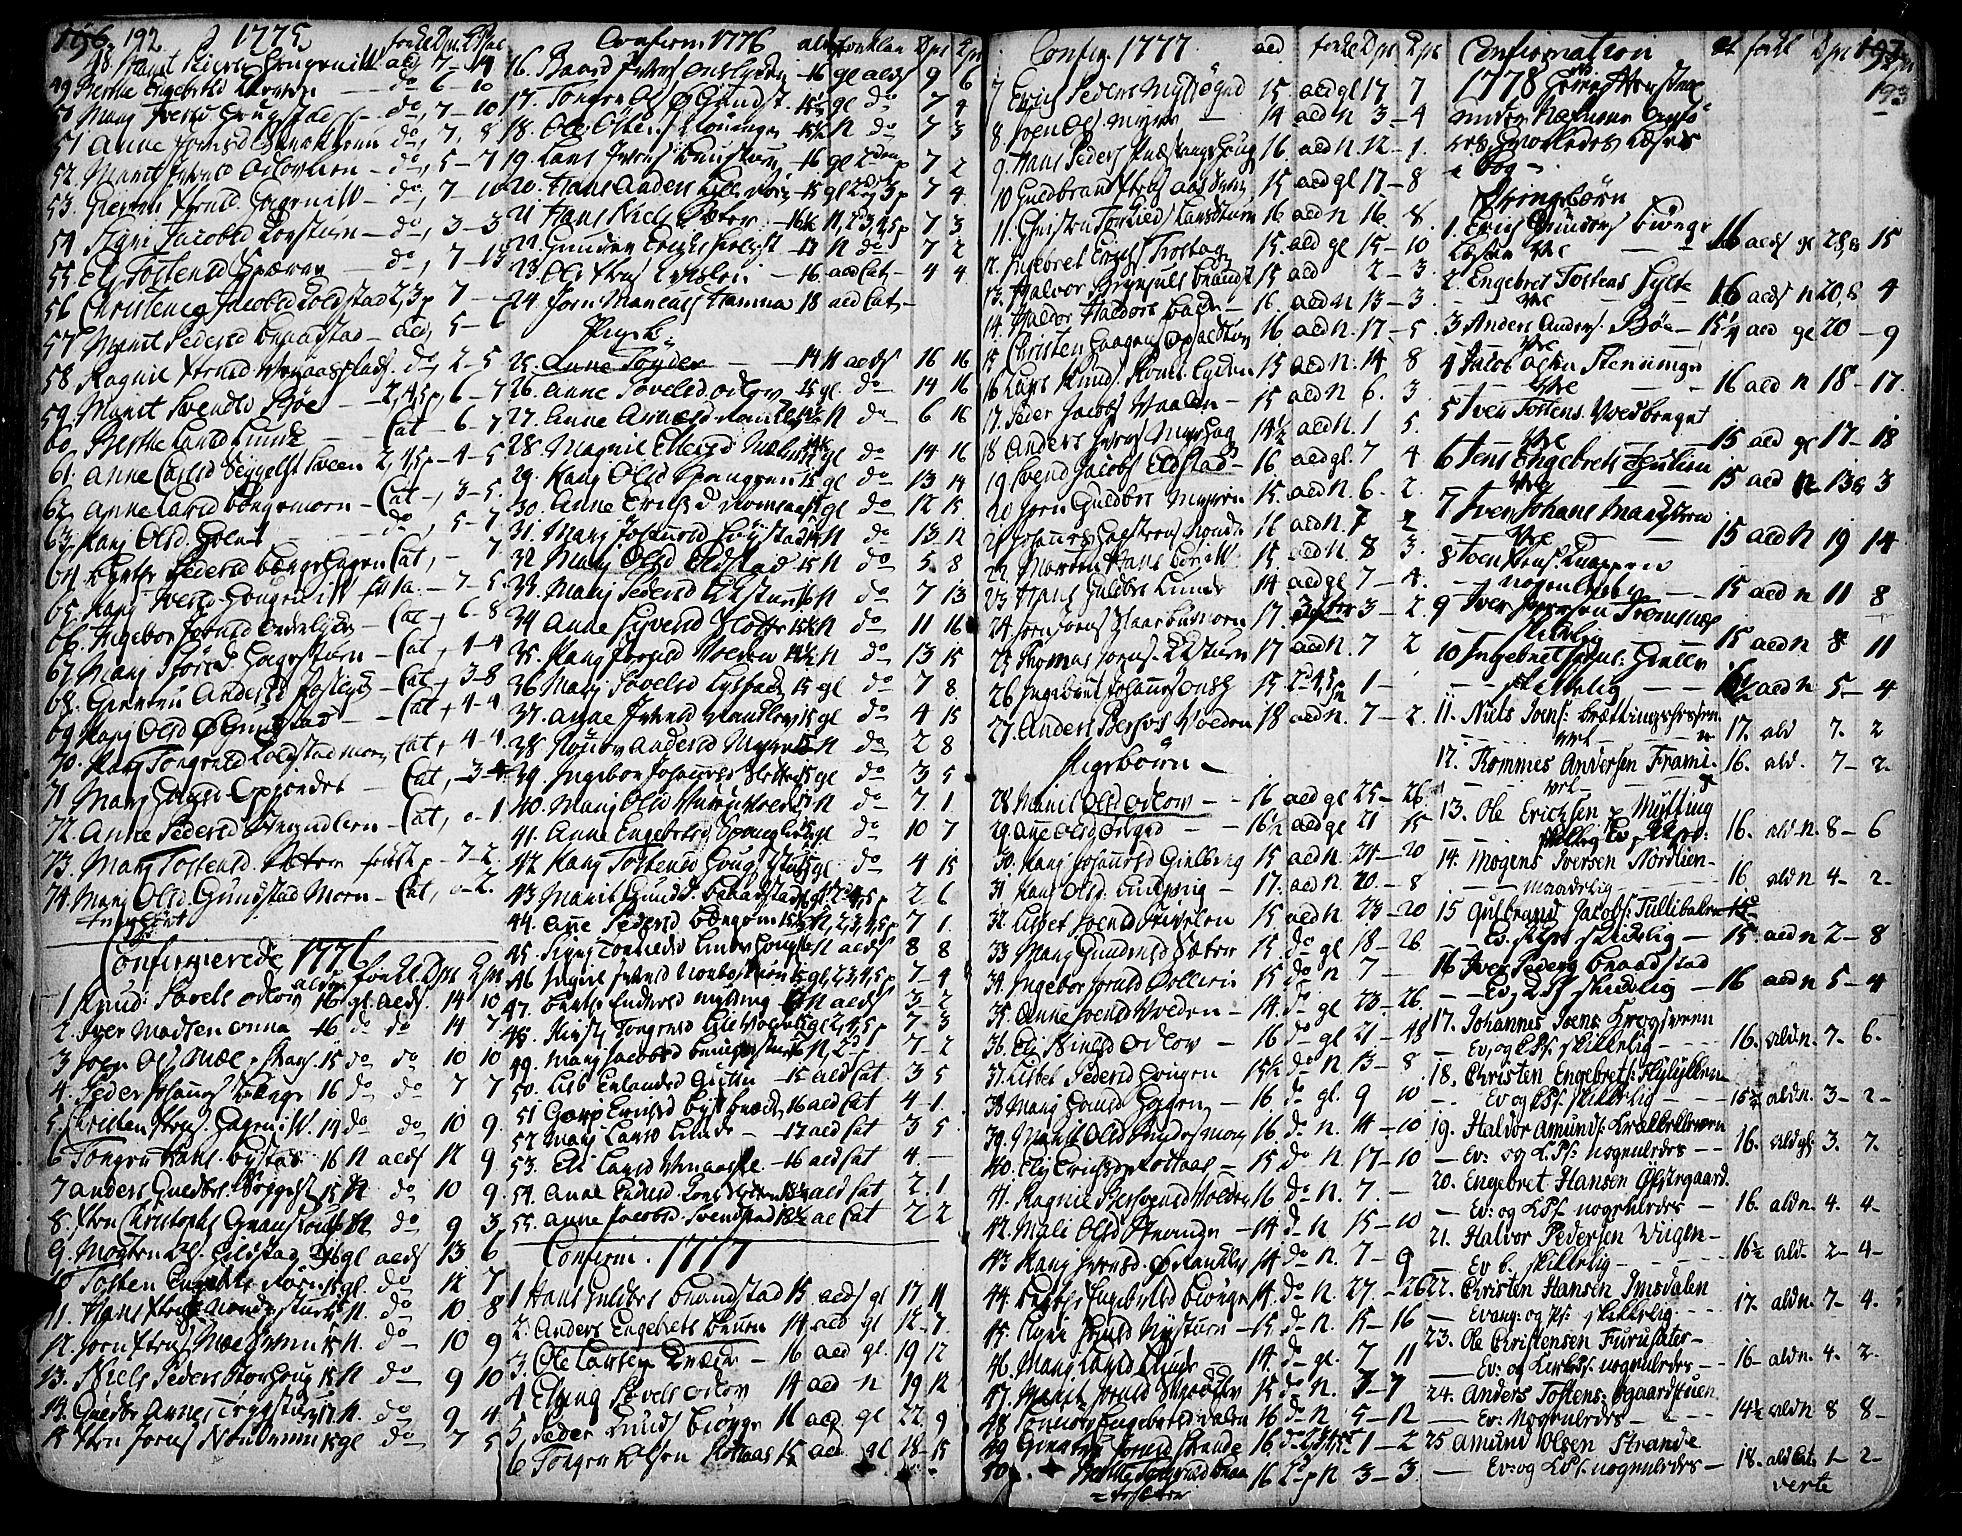 SAH, Ringebu prestekontor, Ministerialbok nr. 2, 1734-1780, s. 192-193